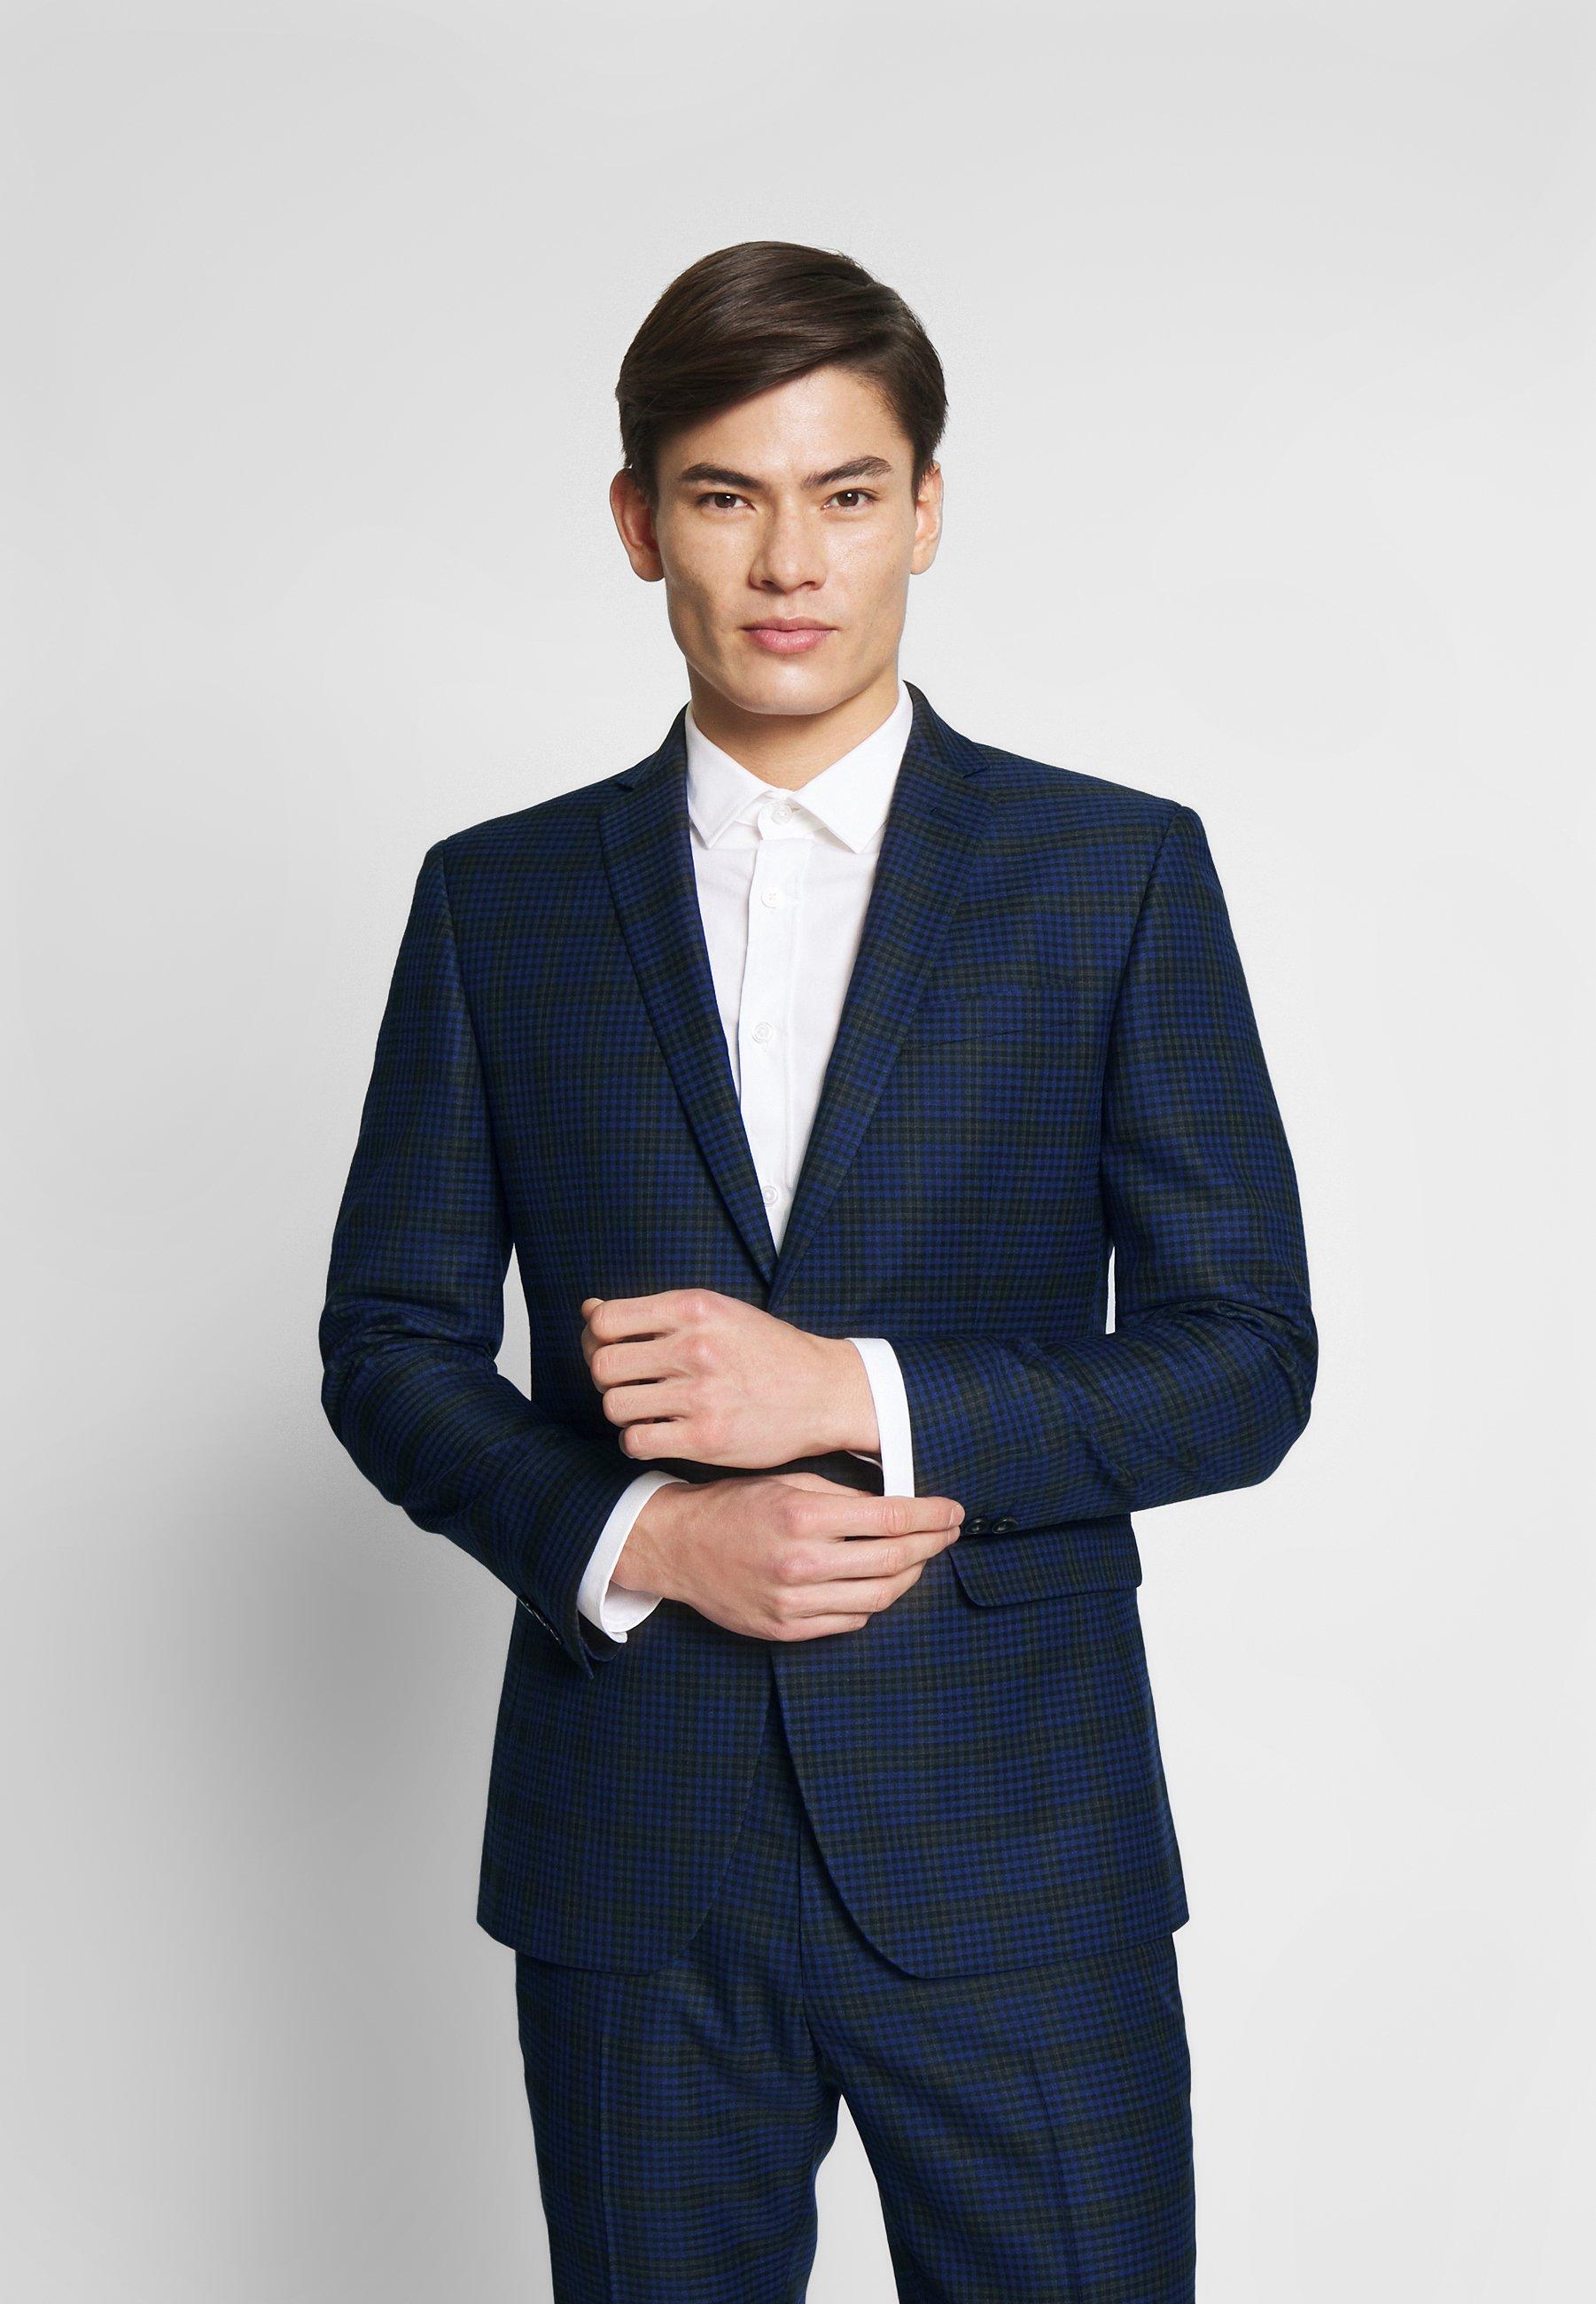 Ben Sherman Tailoring CHECK SUIT - Garnitur - blue - Odzież męska 2020